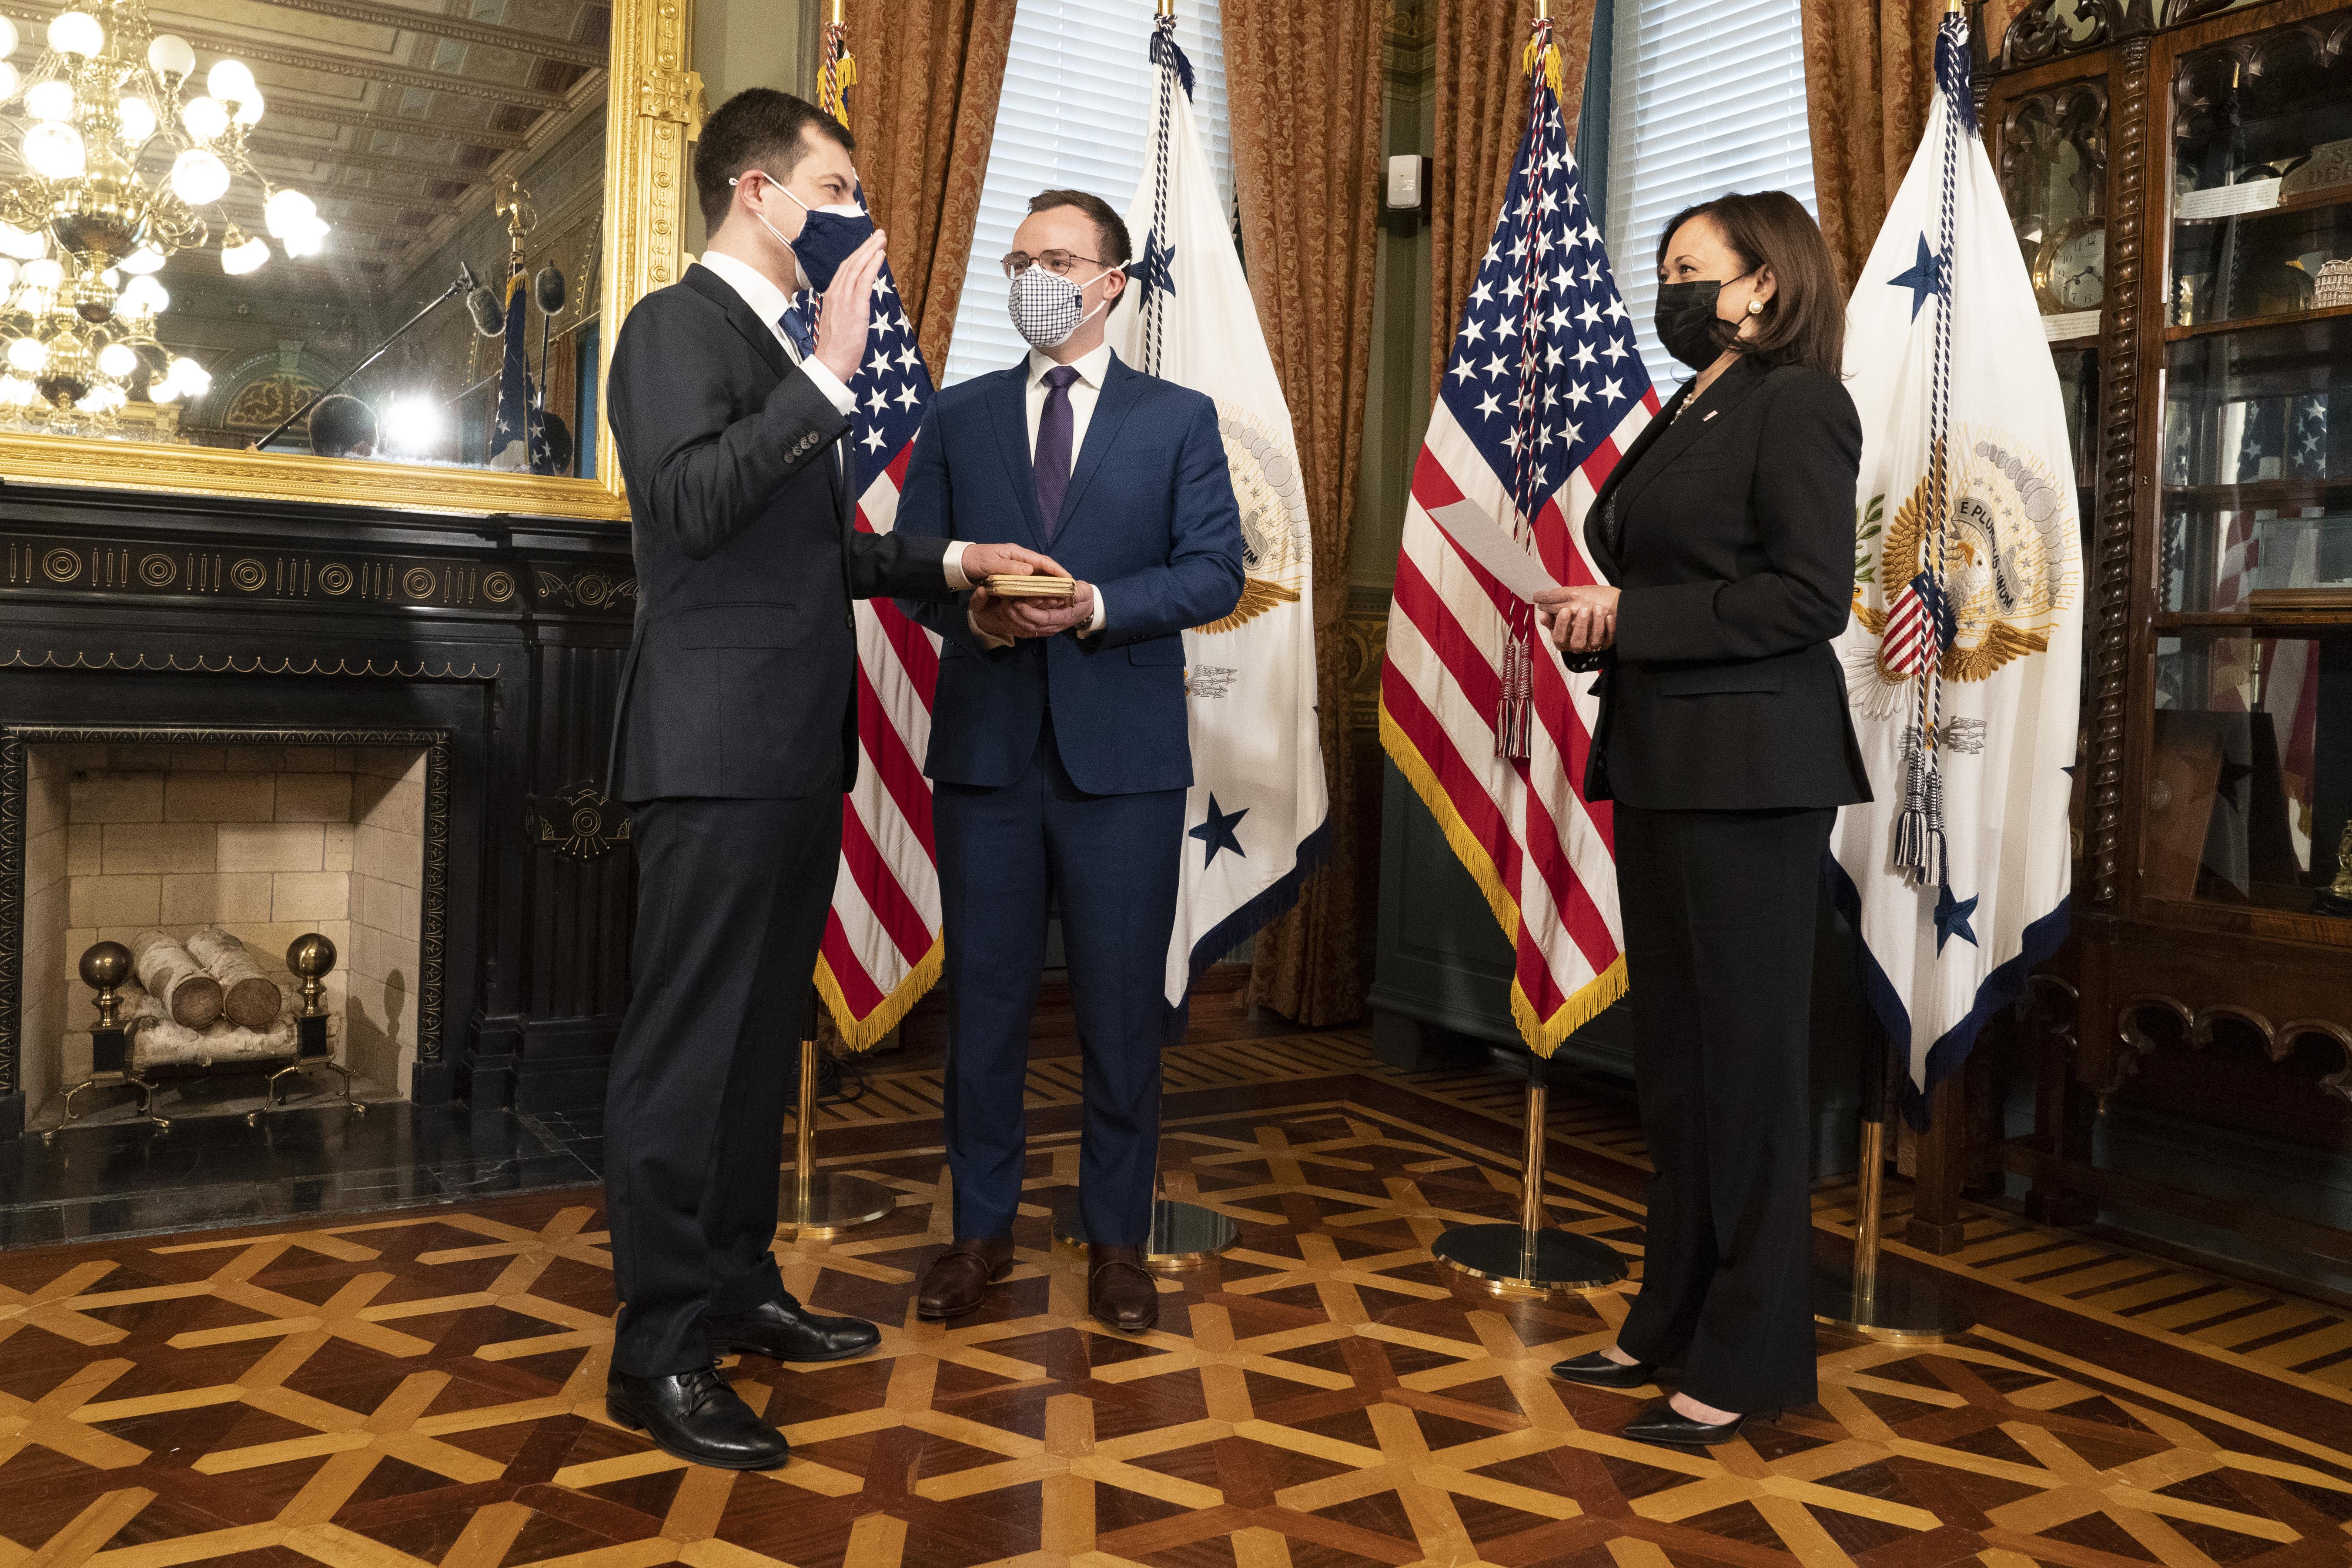 U.S. Vice President Kamala Harris, right, swears in Pete Buttigieg, U.S. secretary of transportation, left, during a ceremony with husband Chasten Buttigieg, center, in Washington, D.C., U.S., on Feb. 3, 2021. (Chris Kleponis/CNP/Bloomberg via Getty Images)